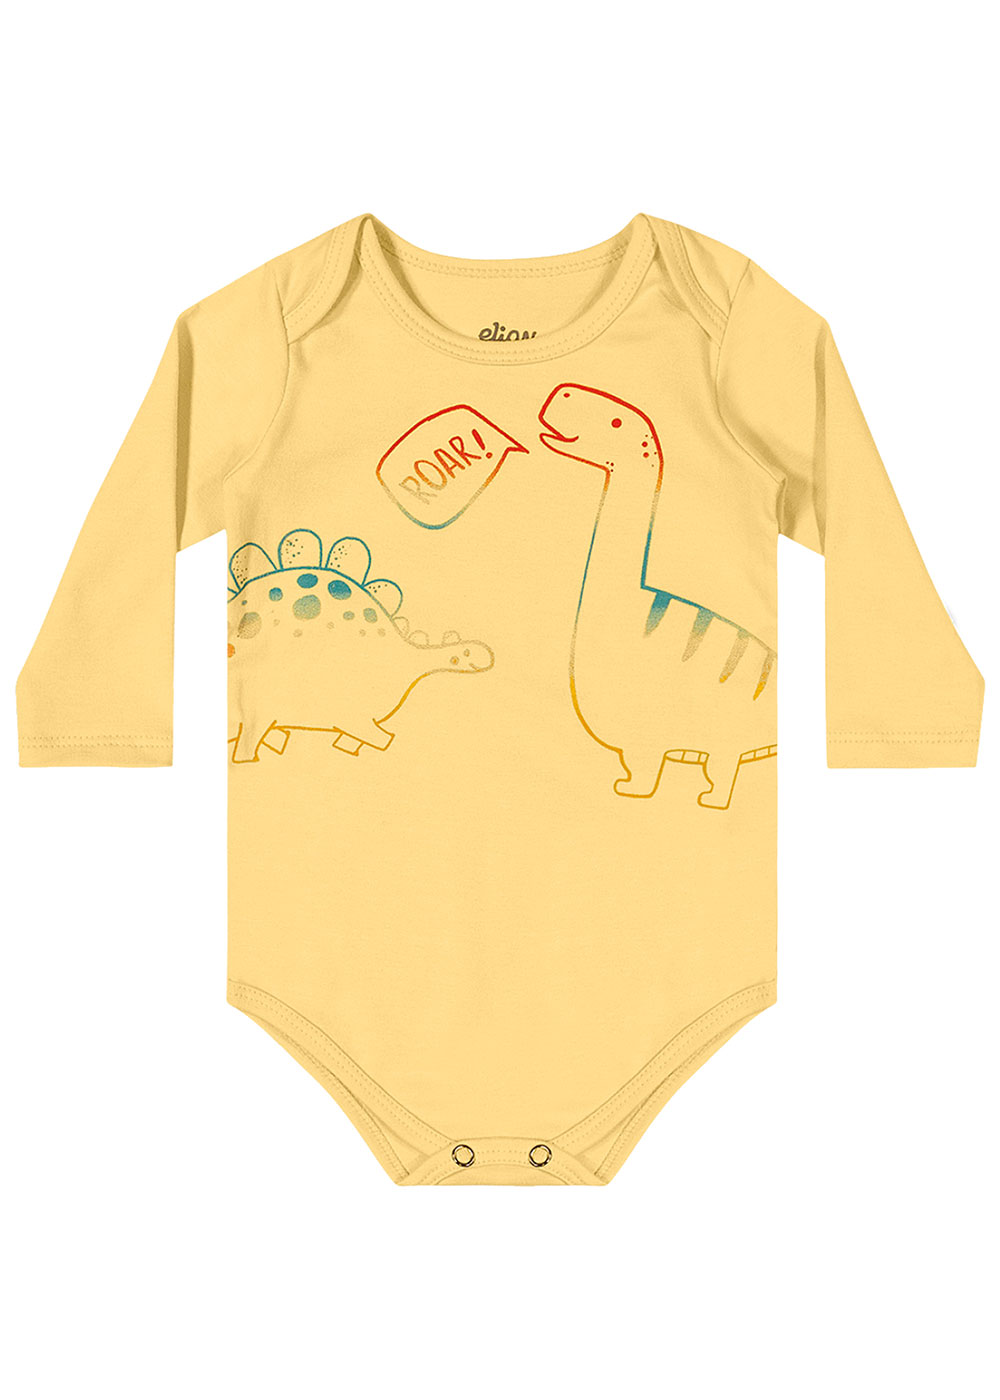 Kit Body Infantil Masculino Inverno Cinza Dino Baby - Elian